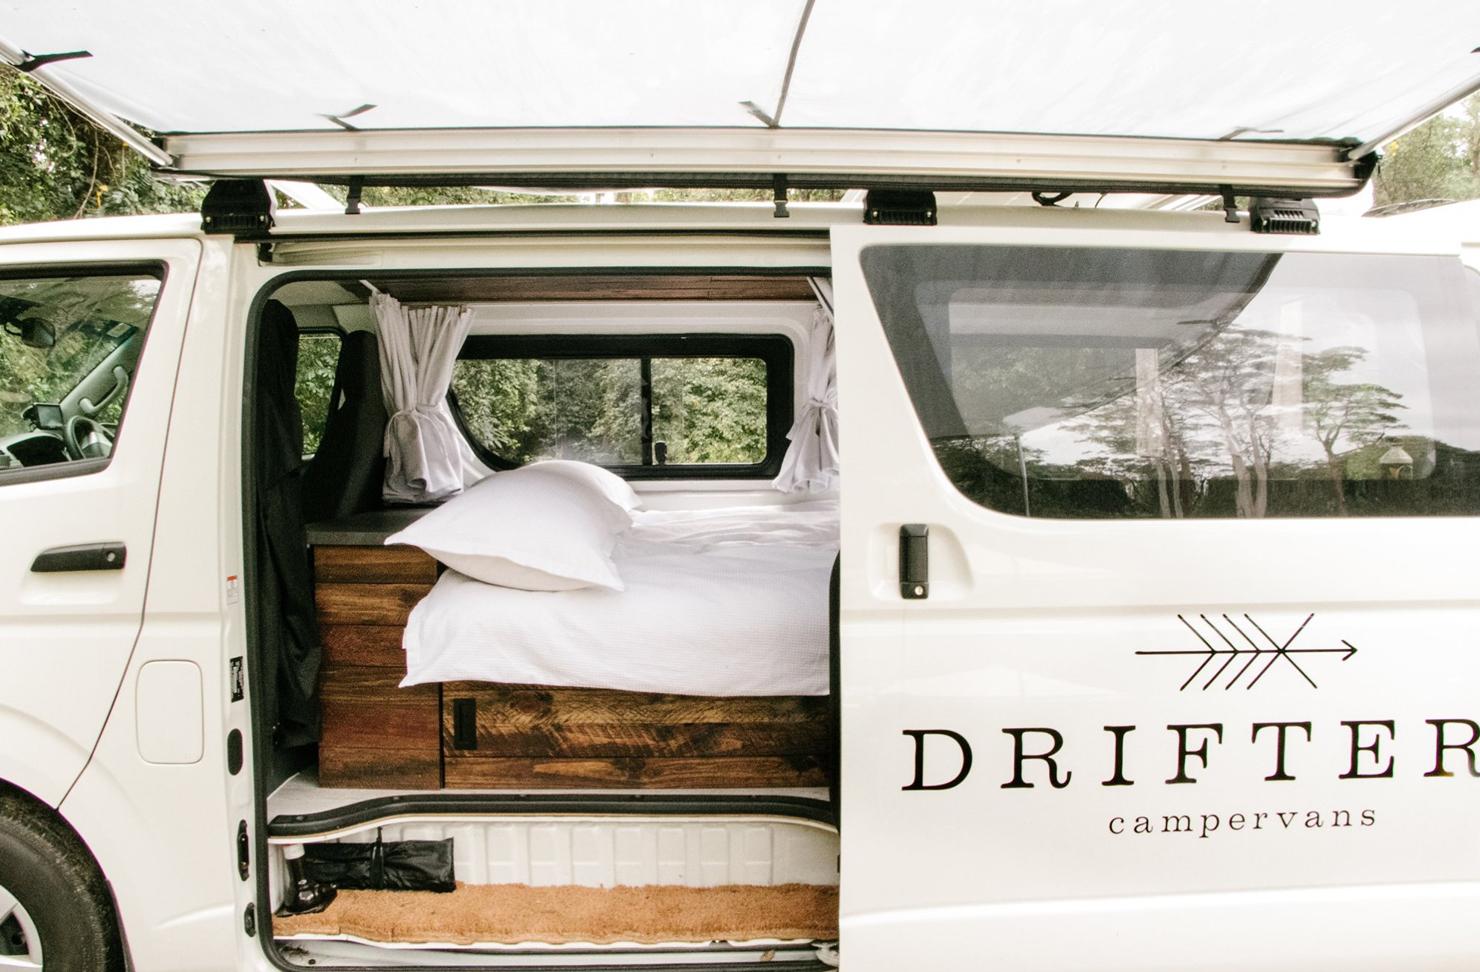 A white camper van with a mattress inside.